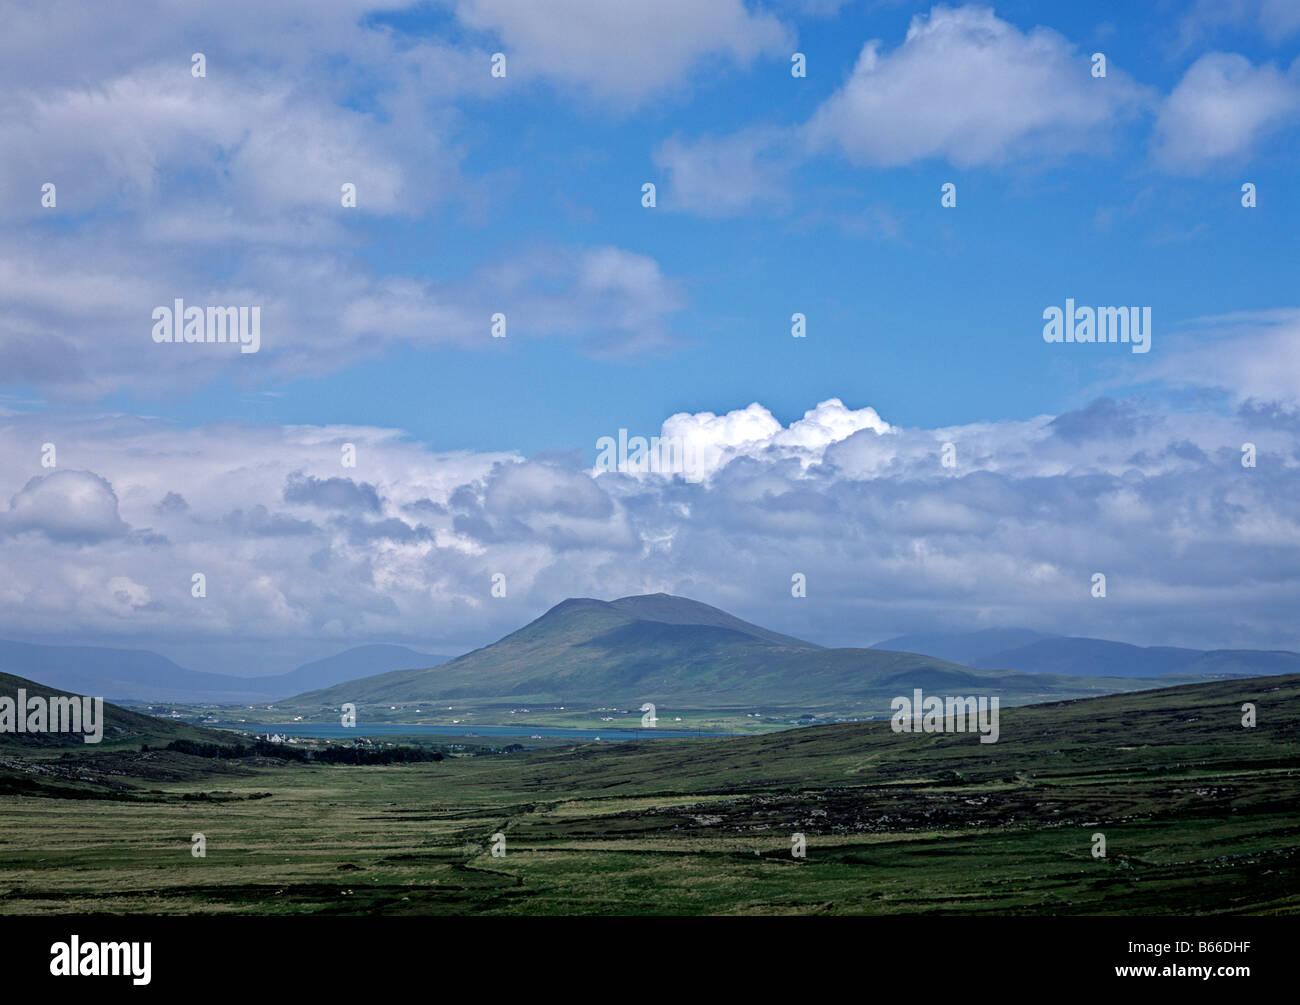 1578 Tonregee from Achill Island Co Mayo Republic of Ireland - Stock Image